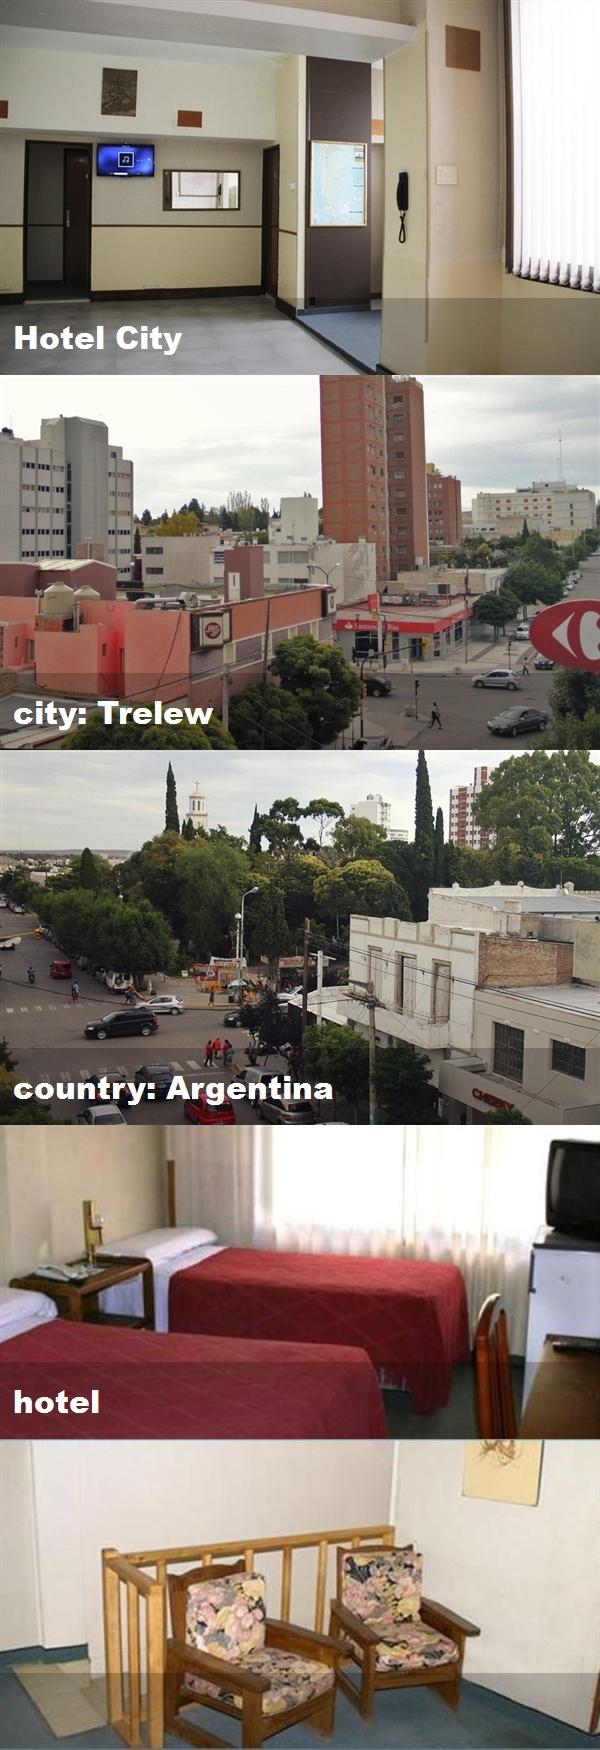 Hotel City, city: Trelew, country: Argentina, hotel